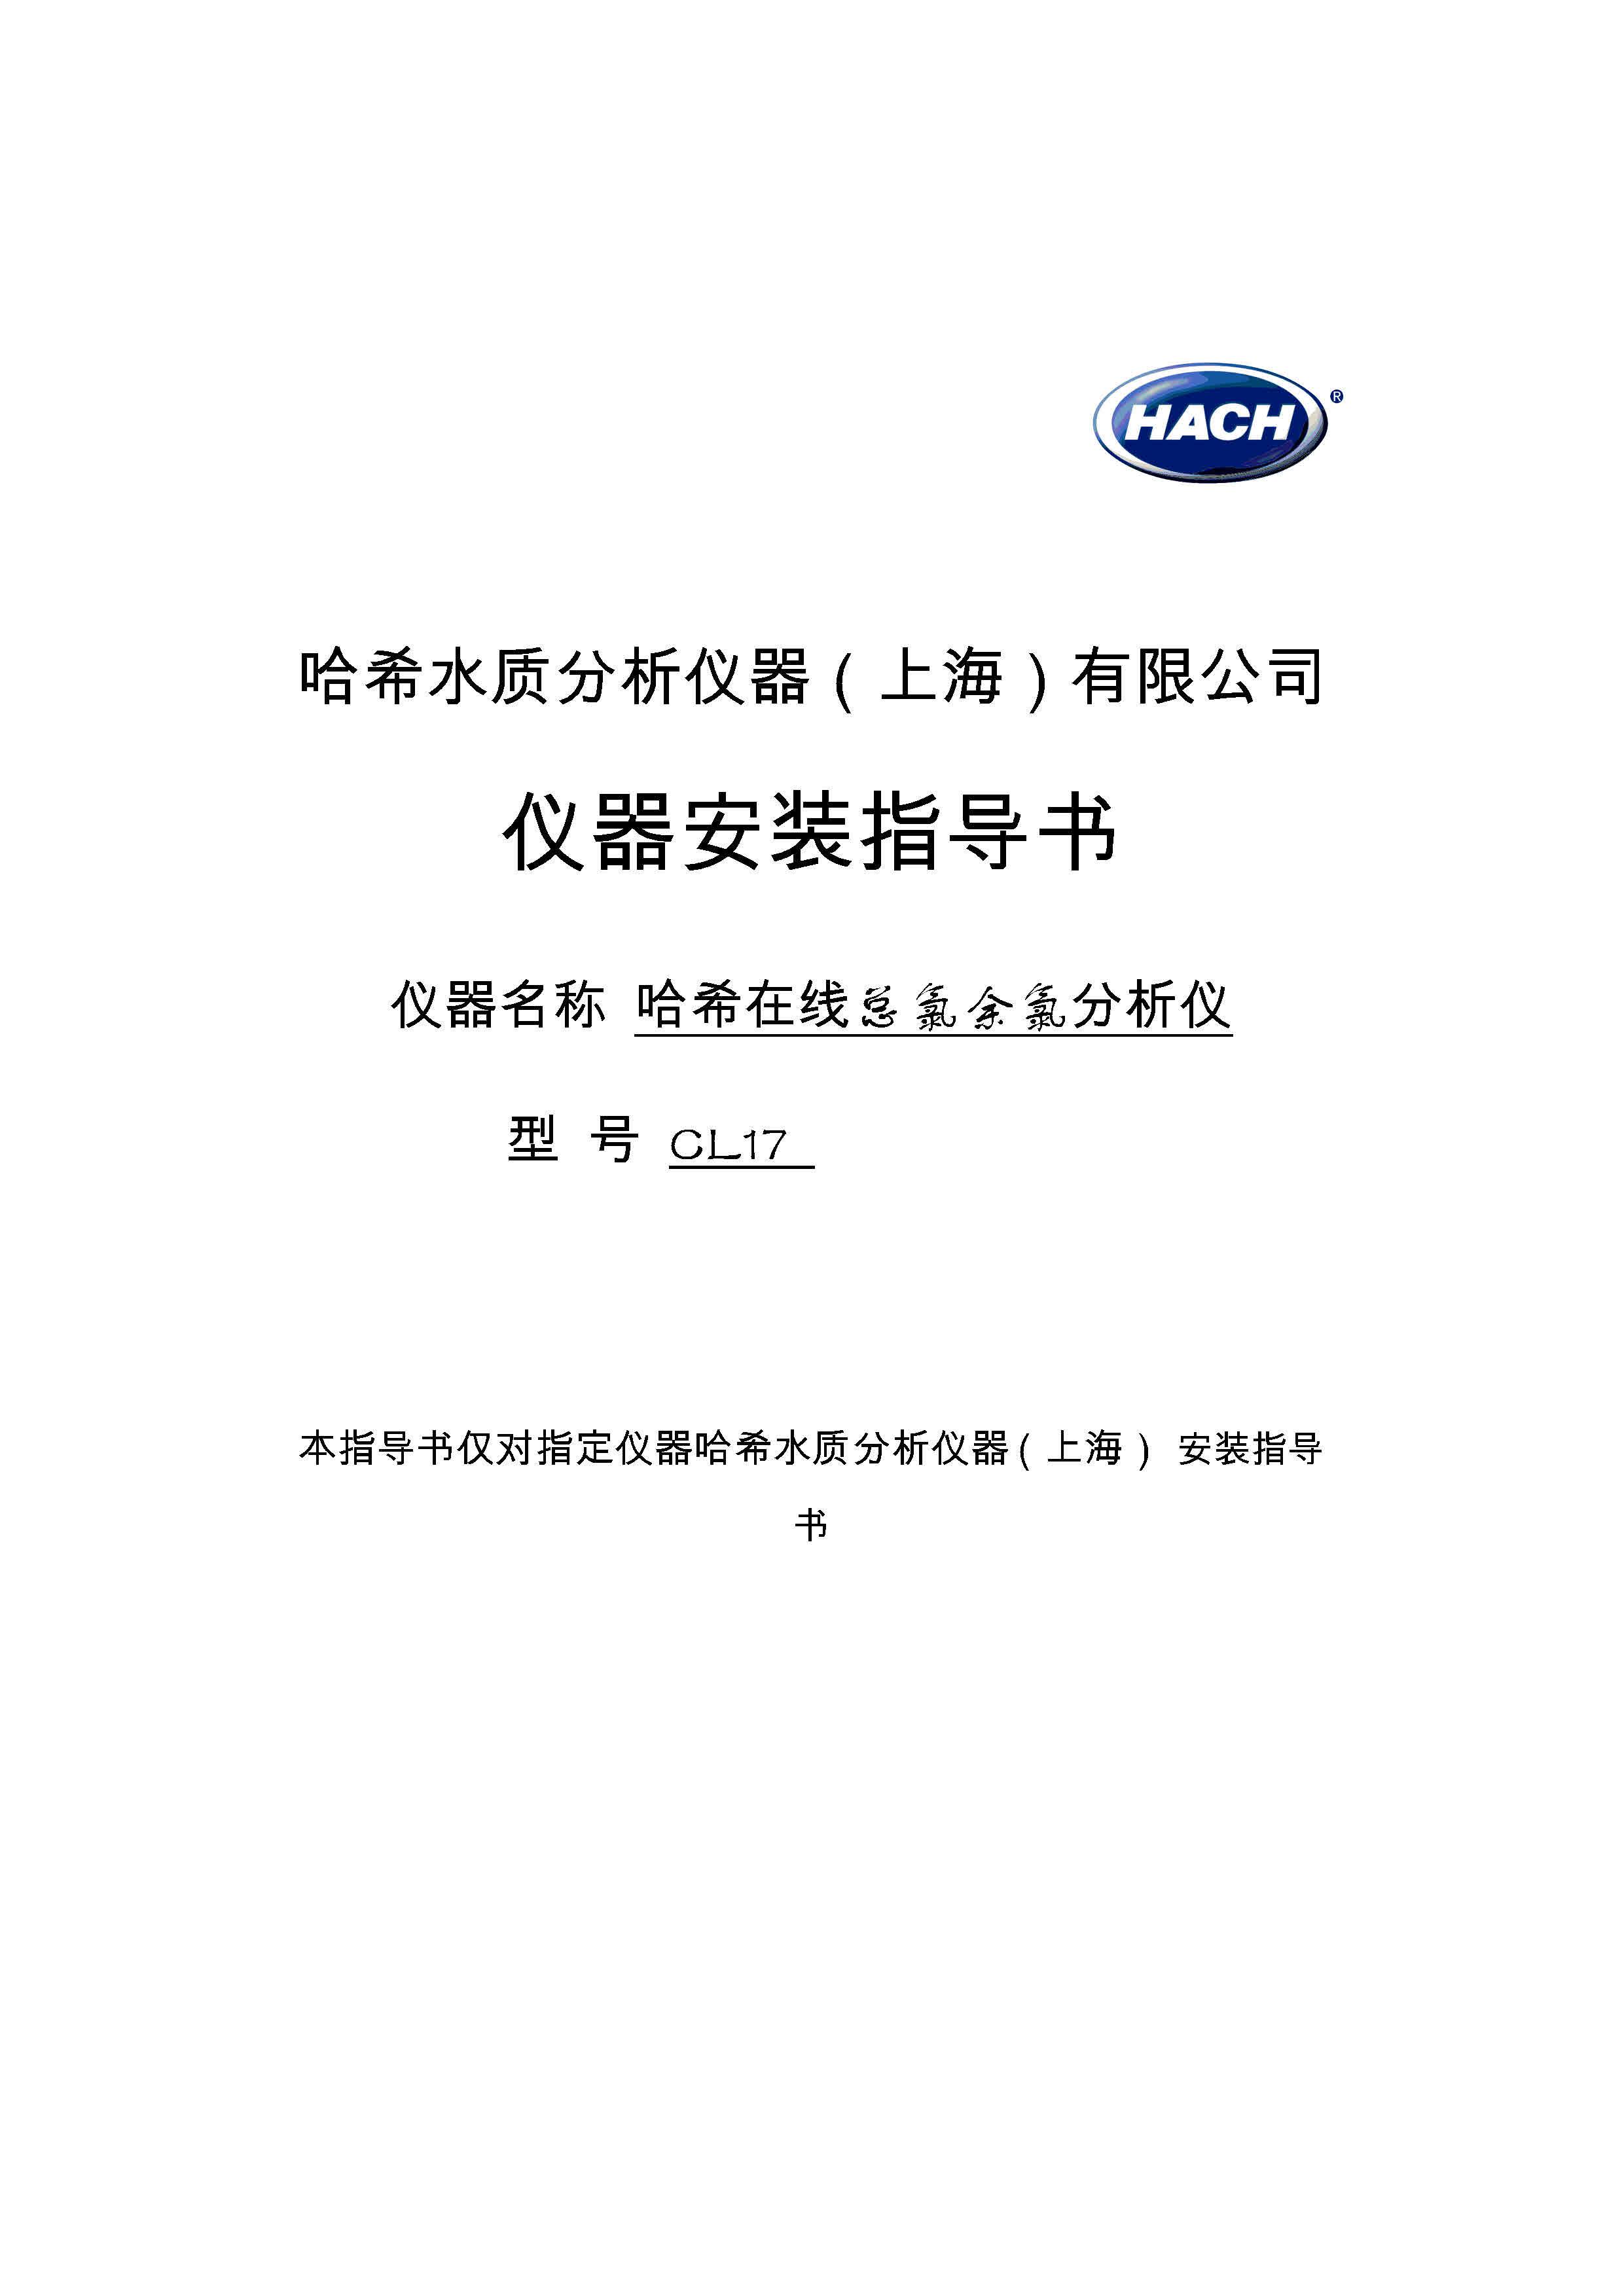 HACH哈希 CL17 安装说明书